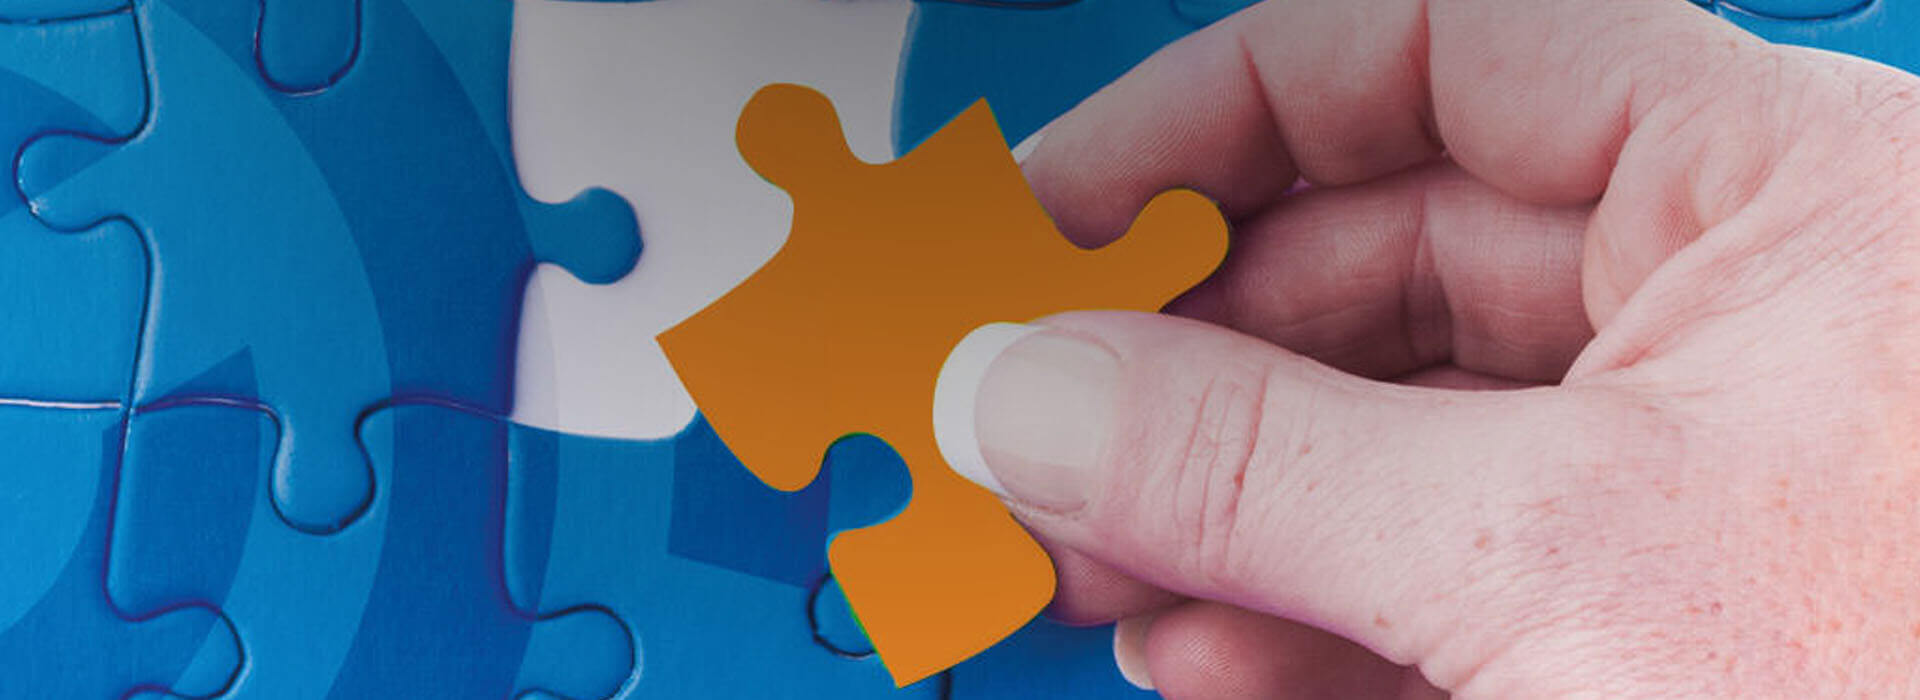 e learning platform services